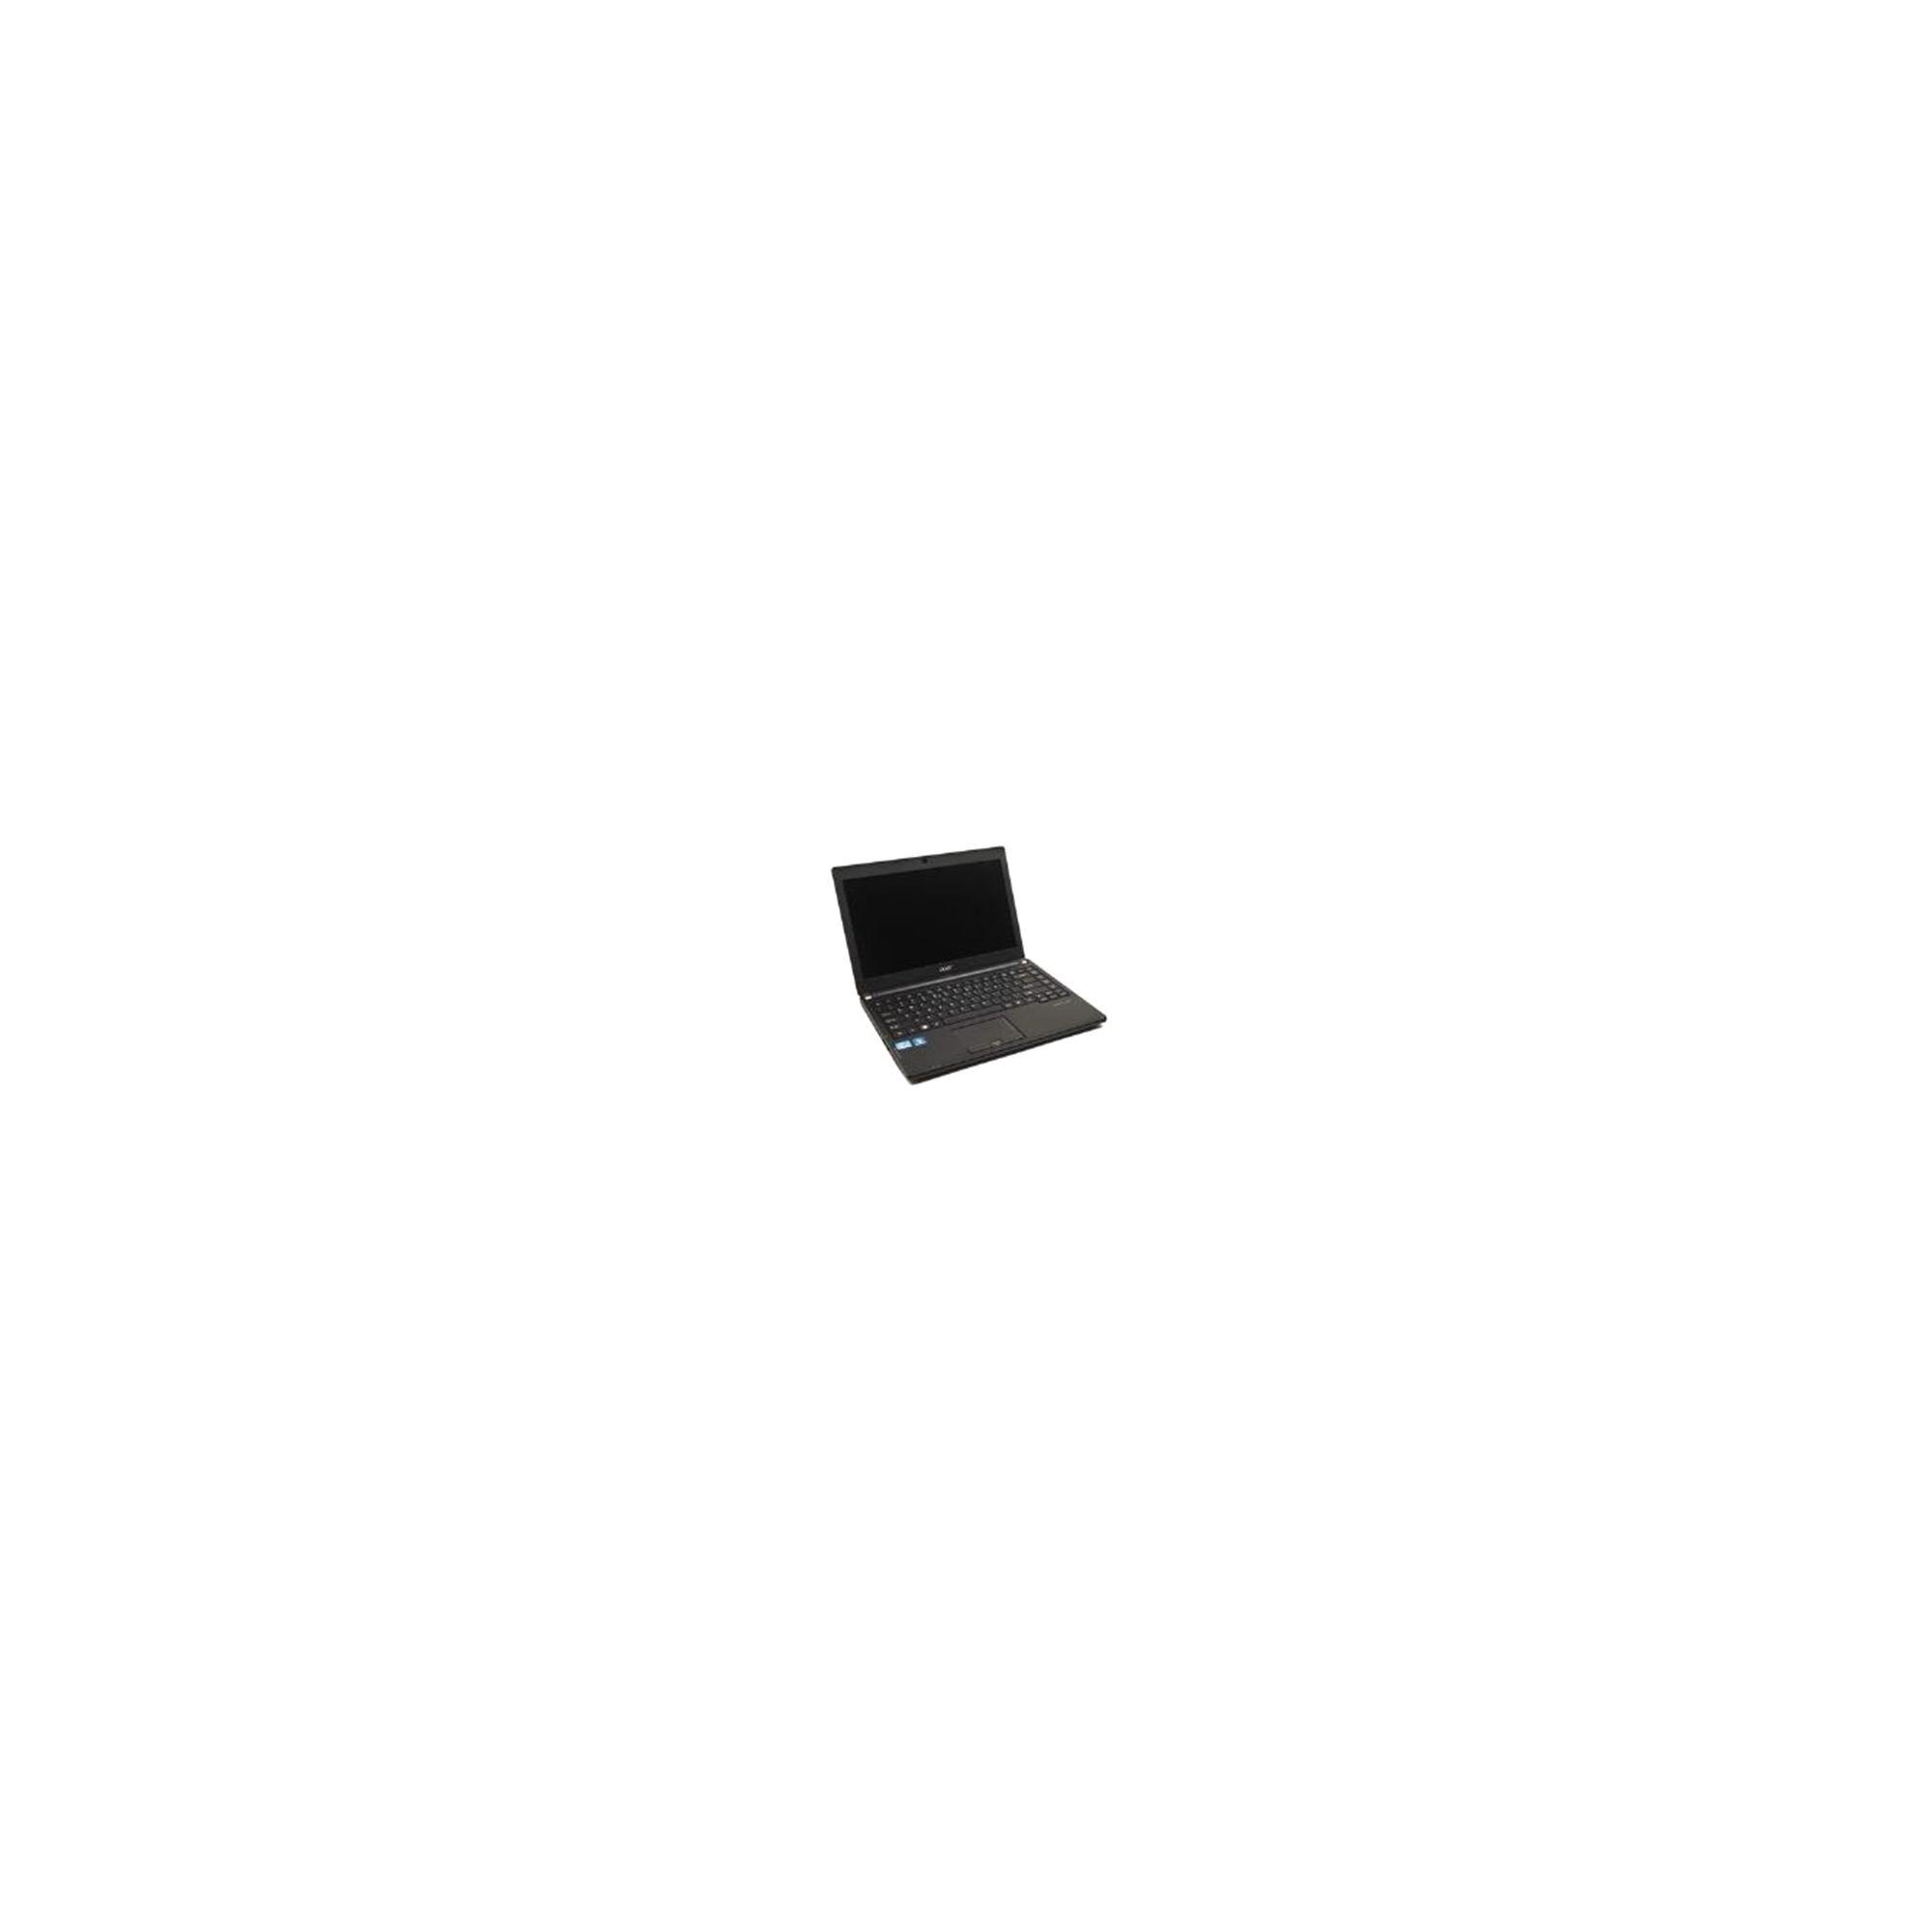 Acer TravelMate TMP633-M-53324G32akk (13.3 inch) Notebook Core i5 (3320M) 2.6GHz 4GB 320GB WLAN BT Webcam Windows 7 Pro 64-bit (UMA Graphics) at Tesco Direct